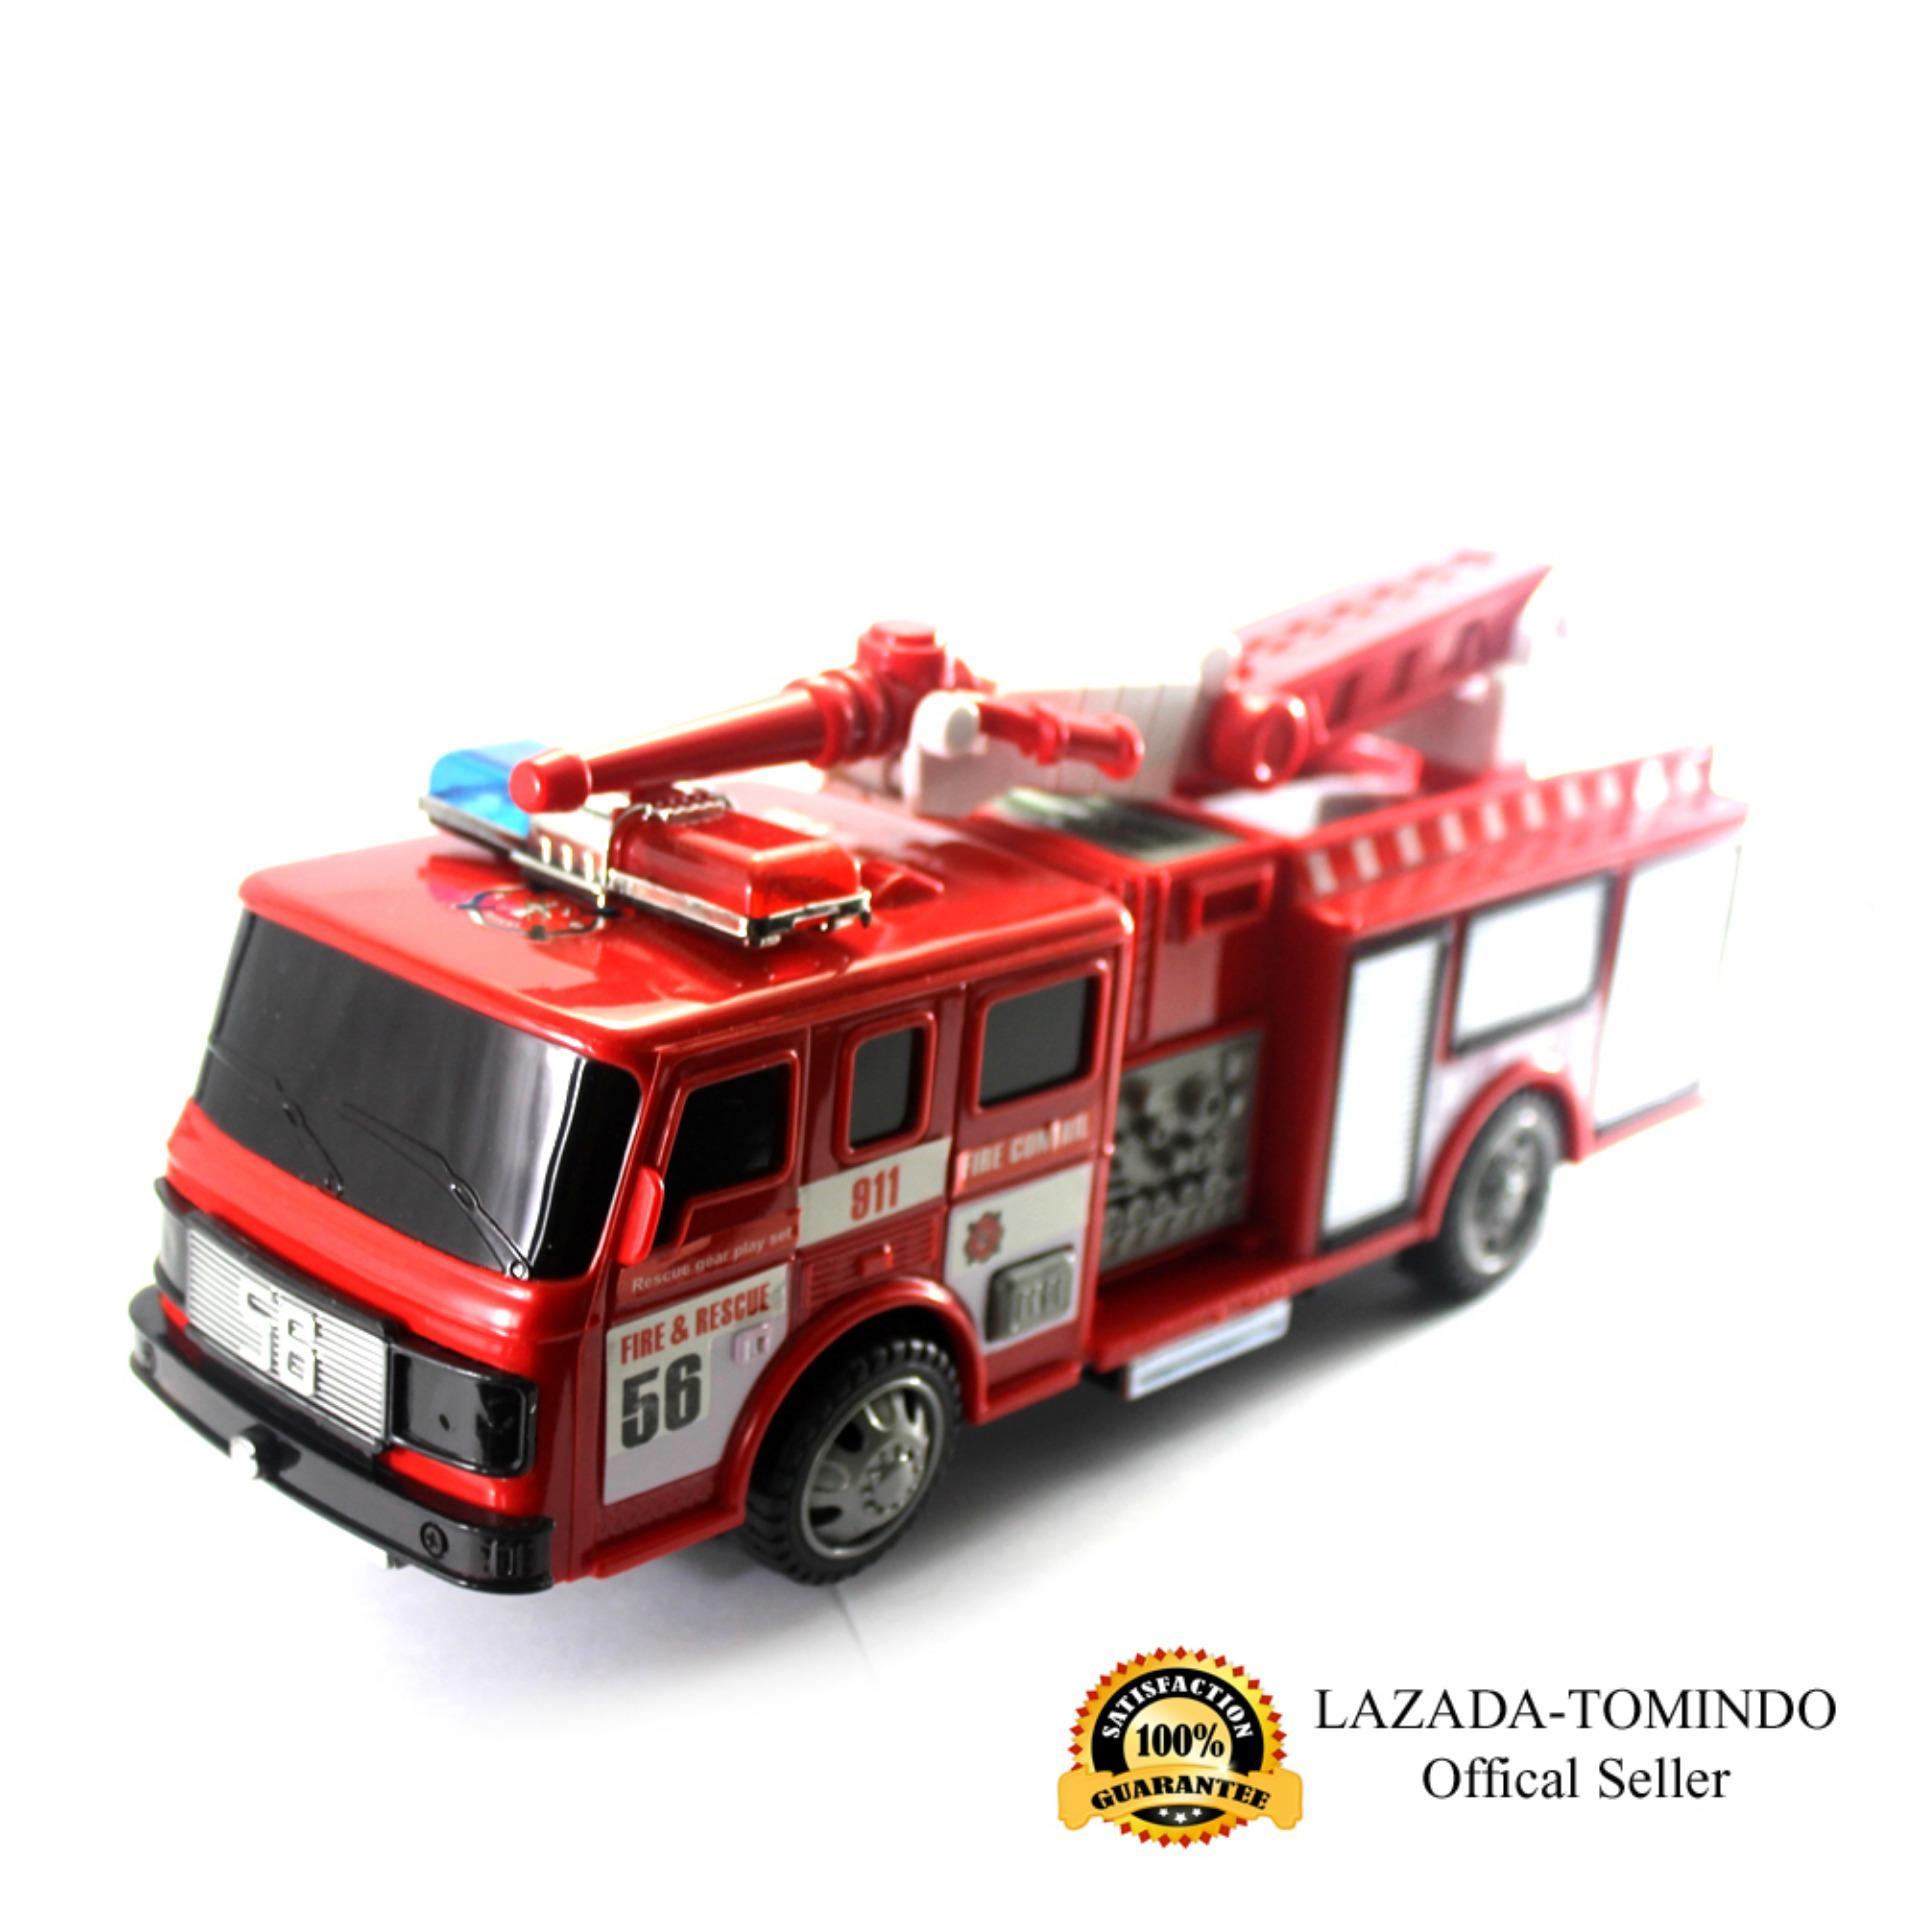 Tomindo Toys Mainan Anak Fire Rescue Car / Mobil Mobilan Pemadam SD024D